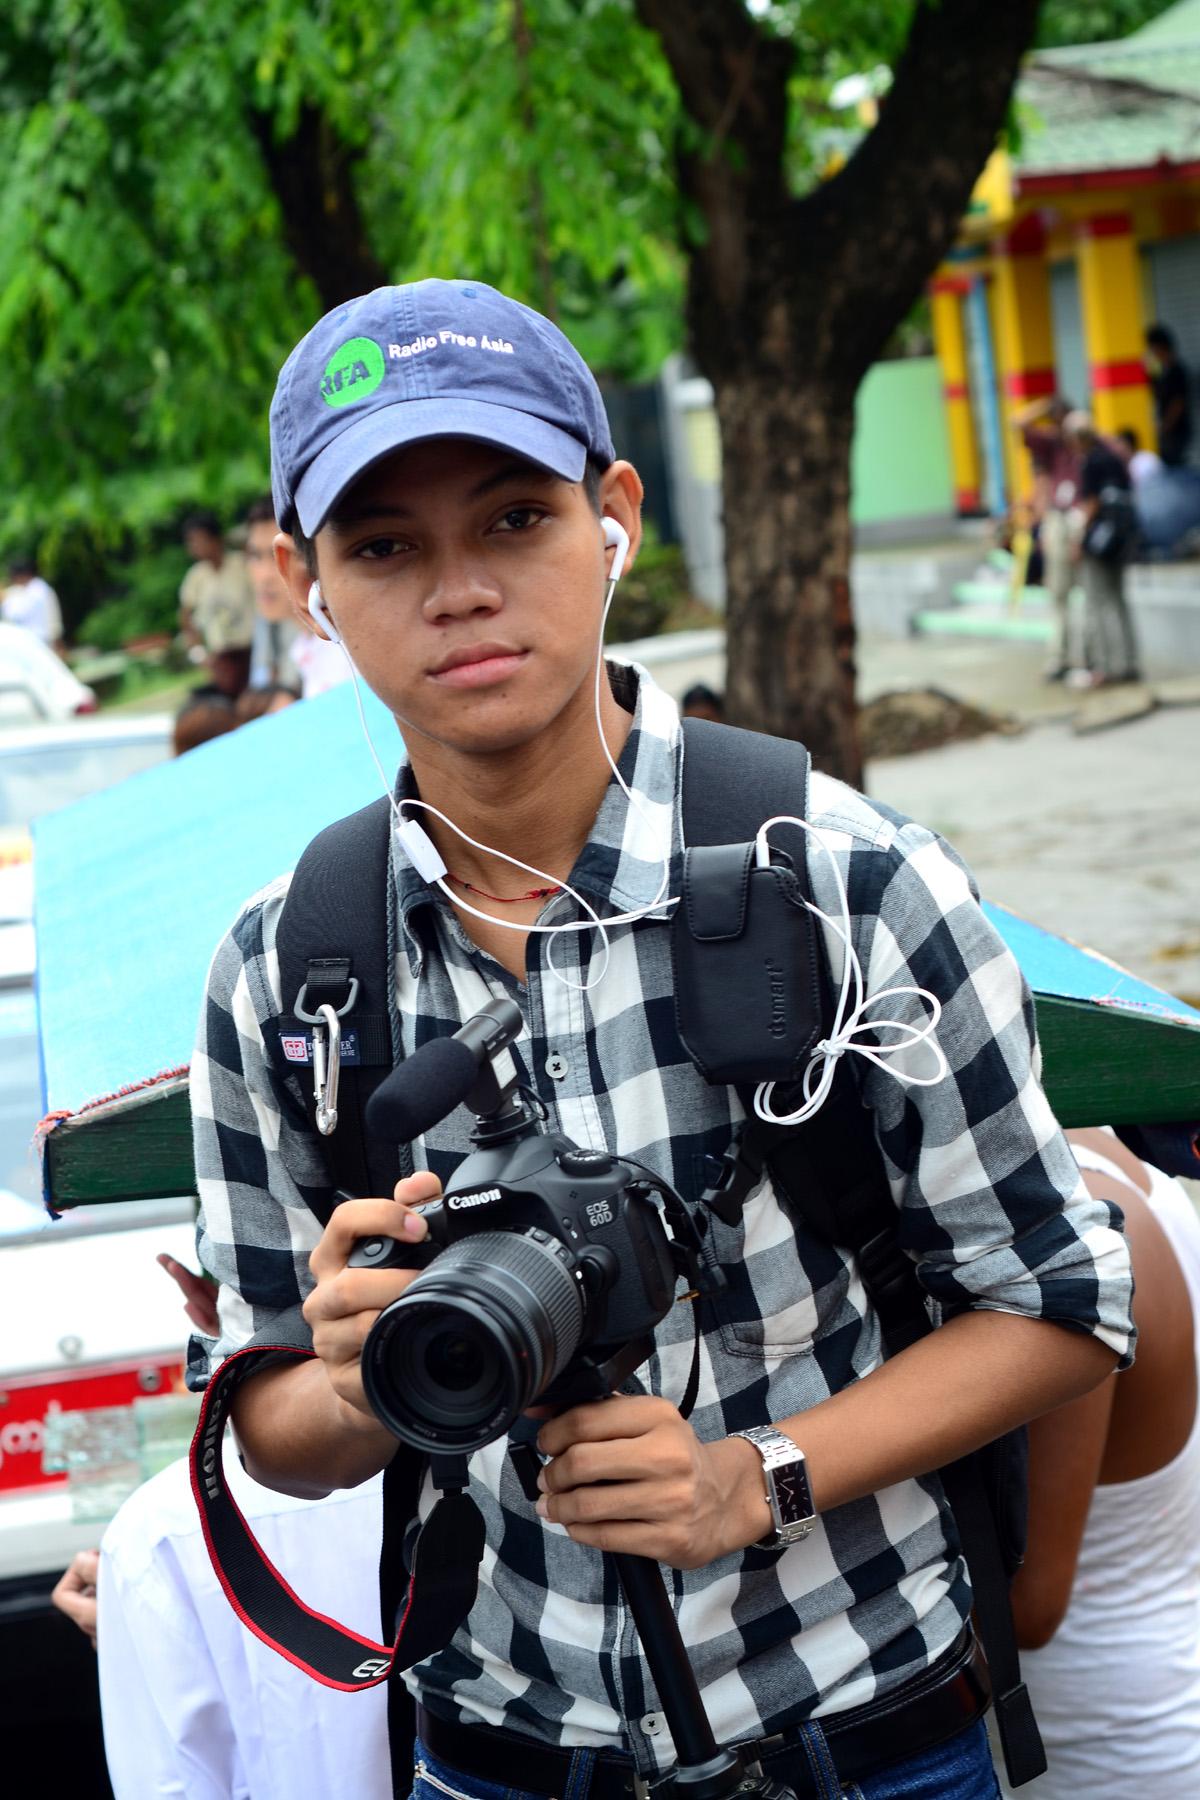 Moe Thu Aung